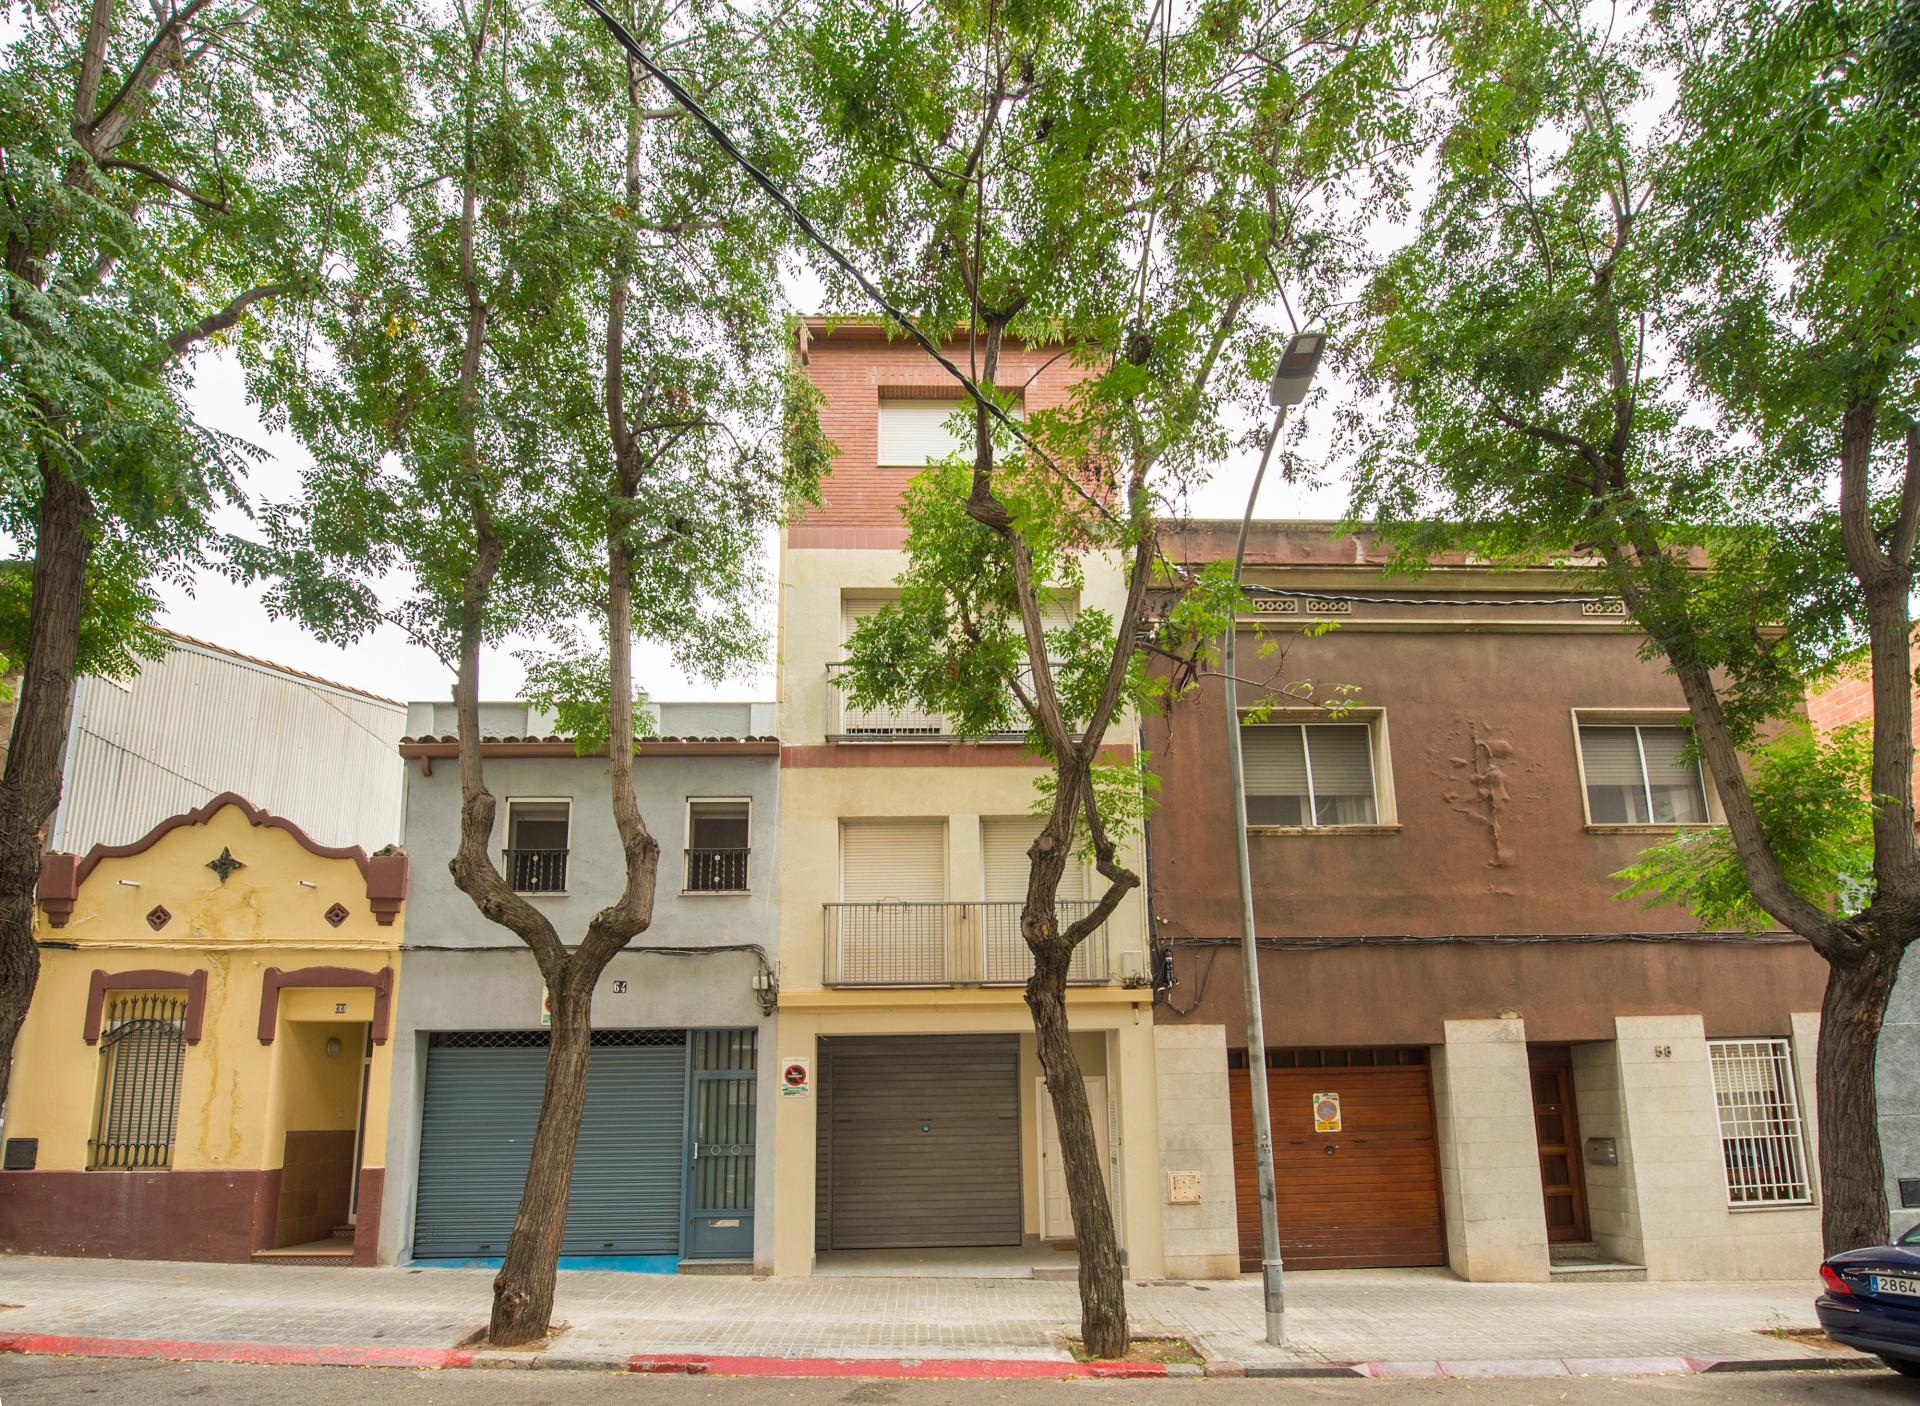 Foto 35 (LL-677/2020) - Unifamiliar adosada en Lloguer a Eixample, Sabadell